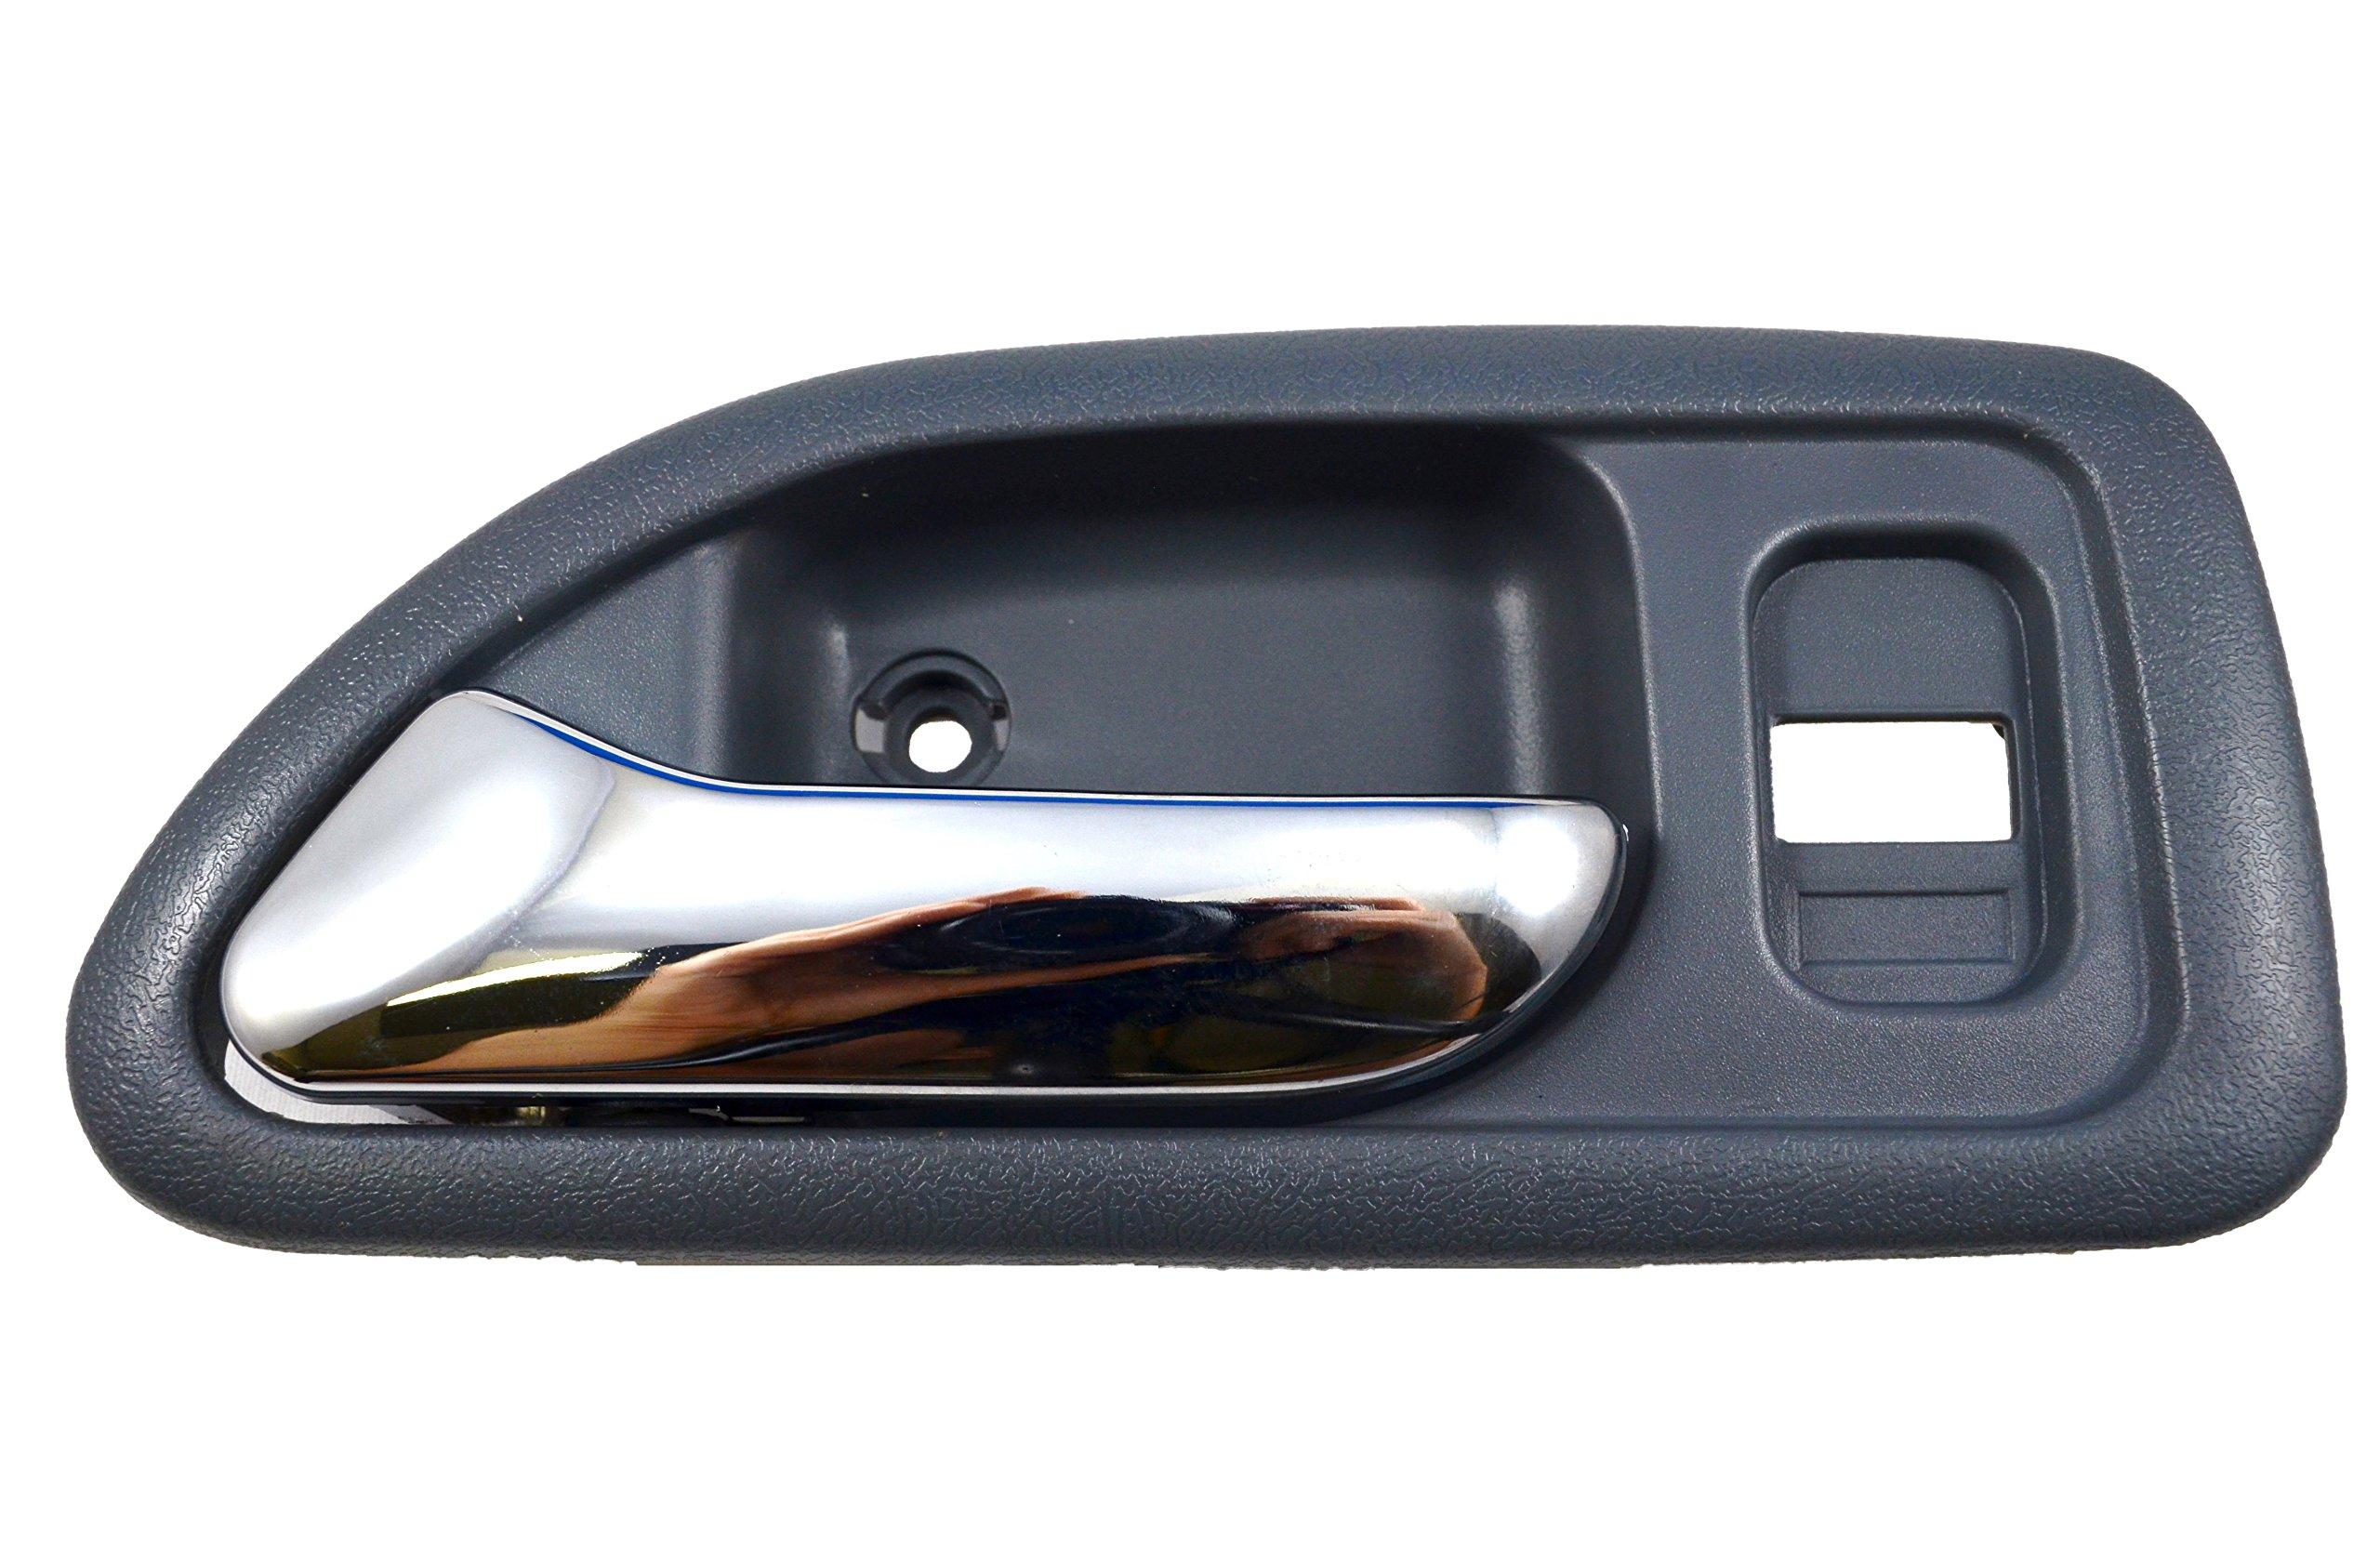 PT Auto Warehouse HO-2579MH-FL - Inside Interior Inner Door Handle, Light Gray Housing with Chrome Lever - 4-Door Sedan, Driver Side Front